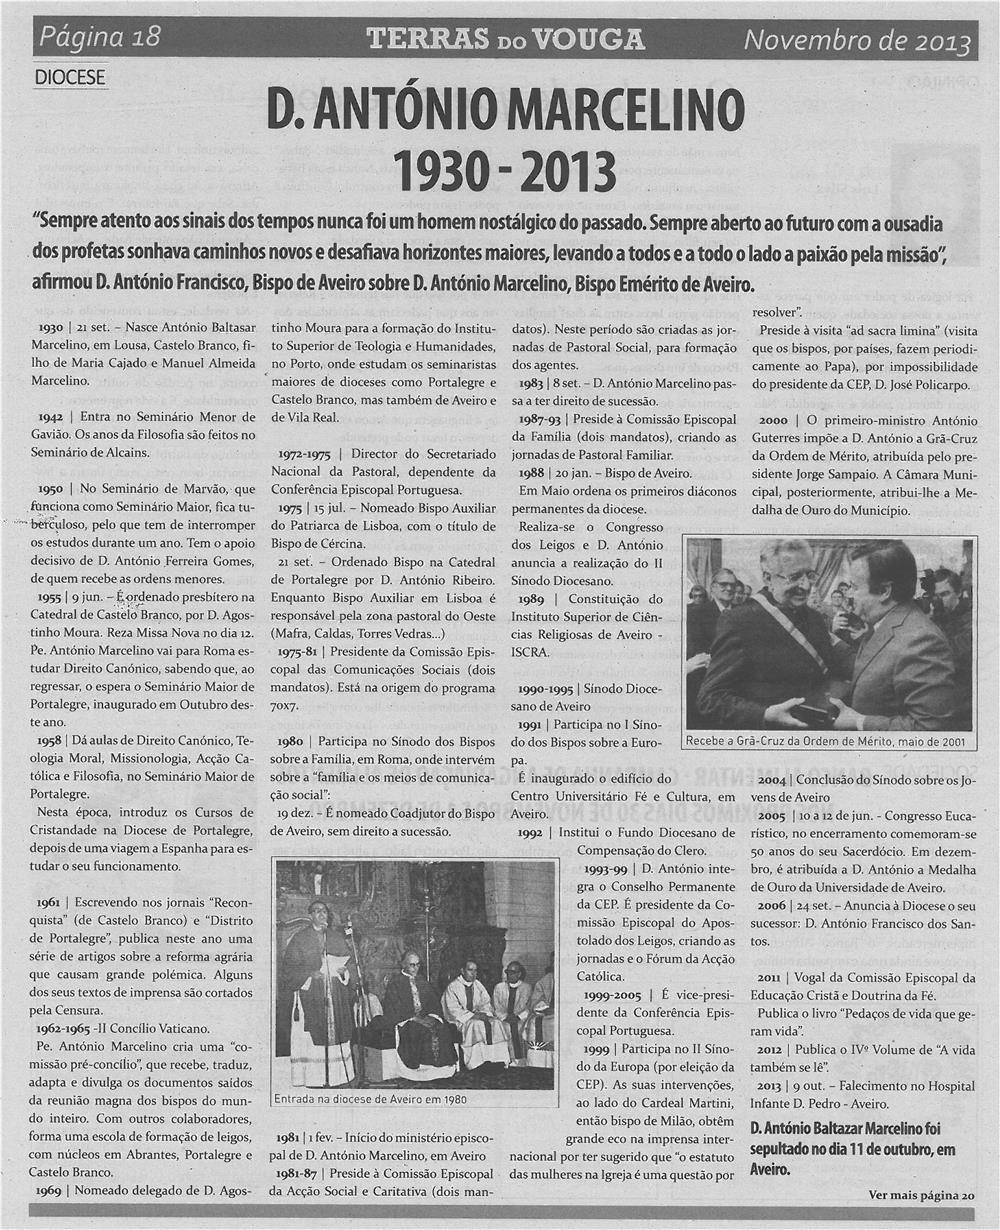 TV-nov13-p18-D. António Marcelino : 1930-2013